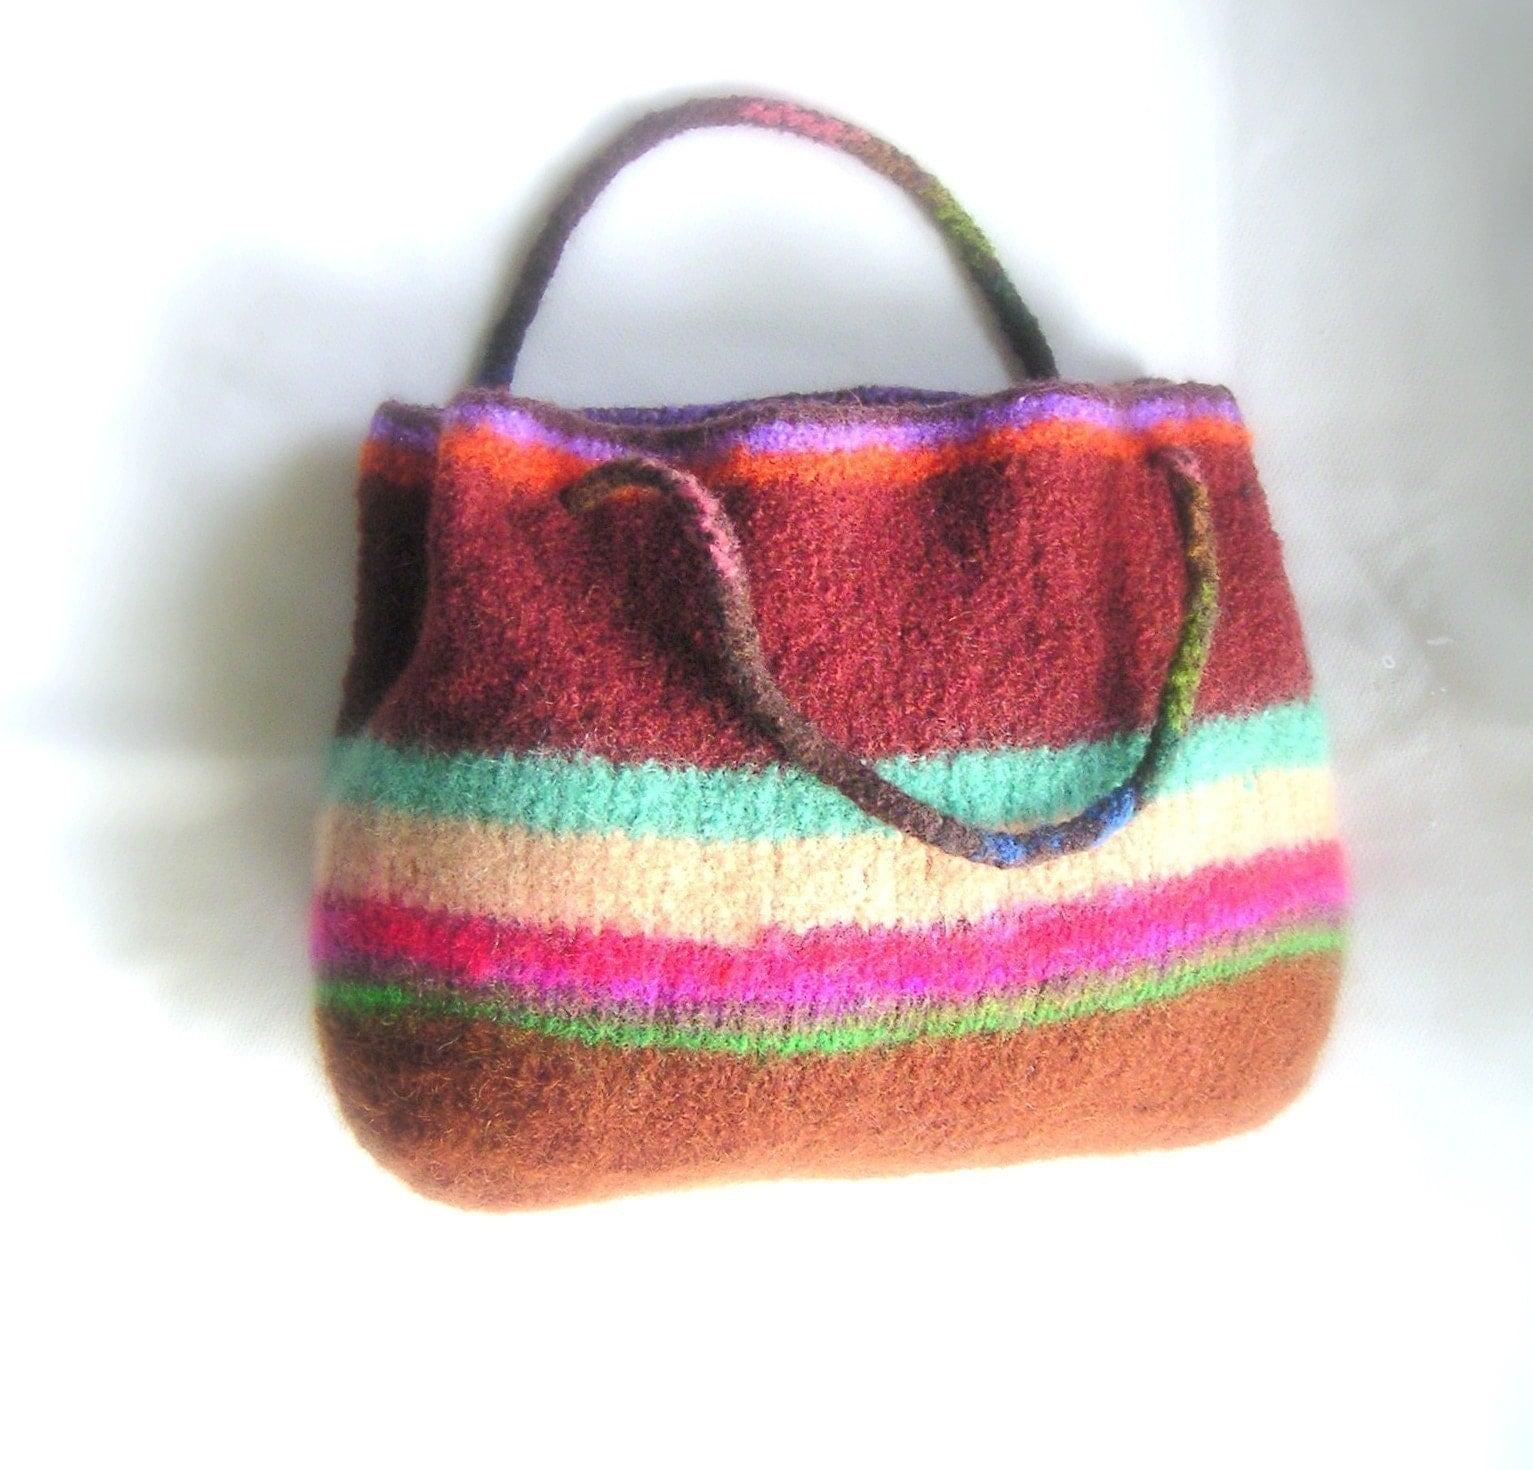 Felted Purse Knitting Patterns : Easy Knit Felted Pattern pdf Tote Bag by GraceKnittingPattern